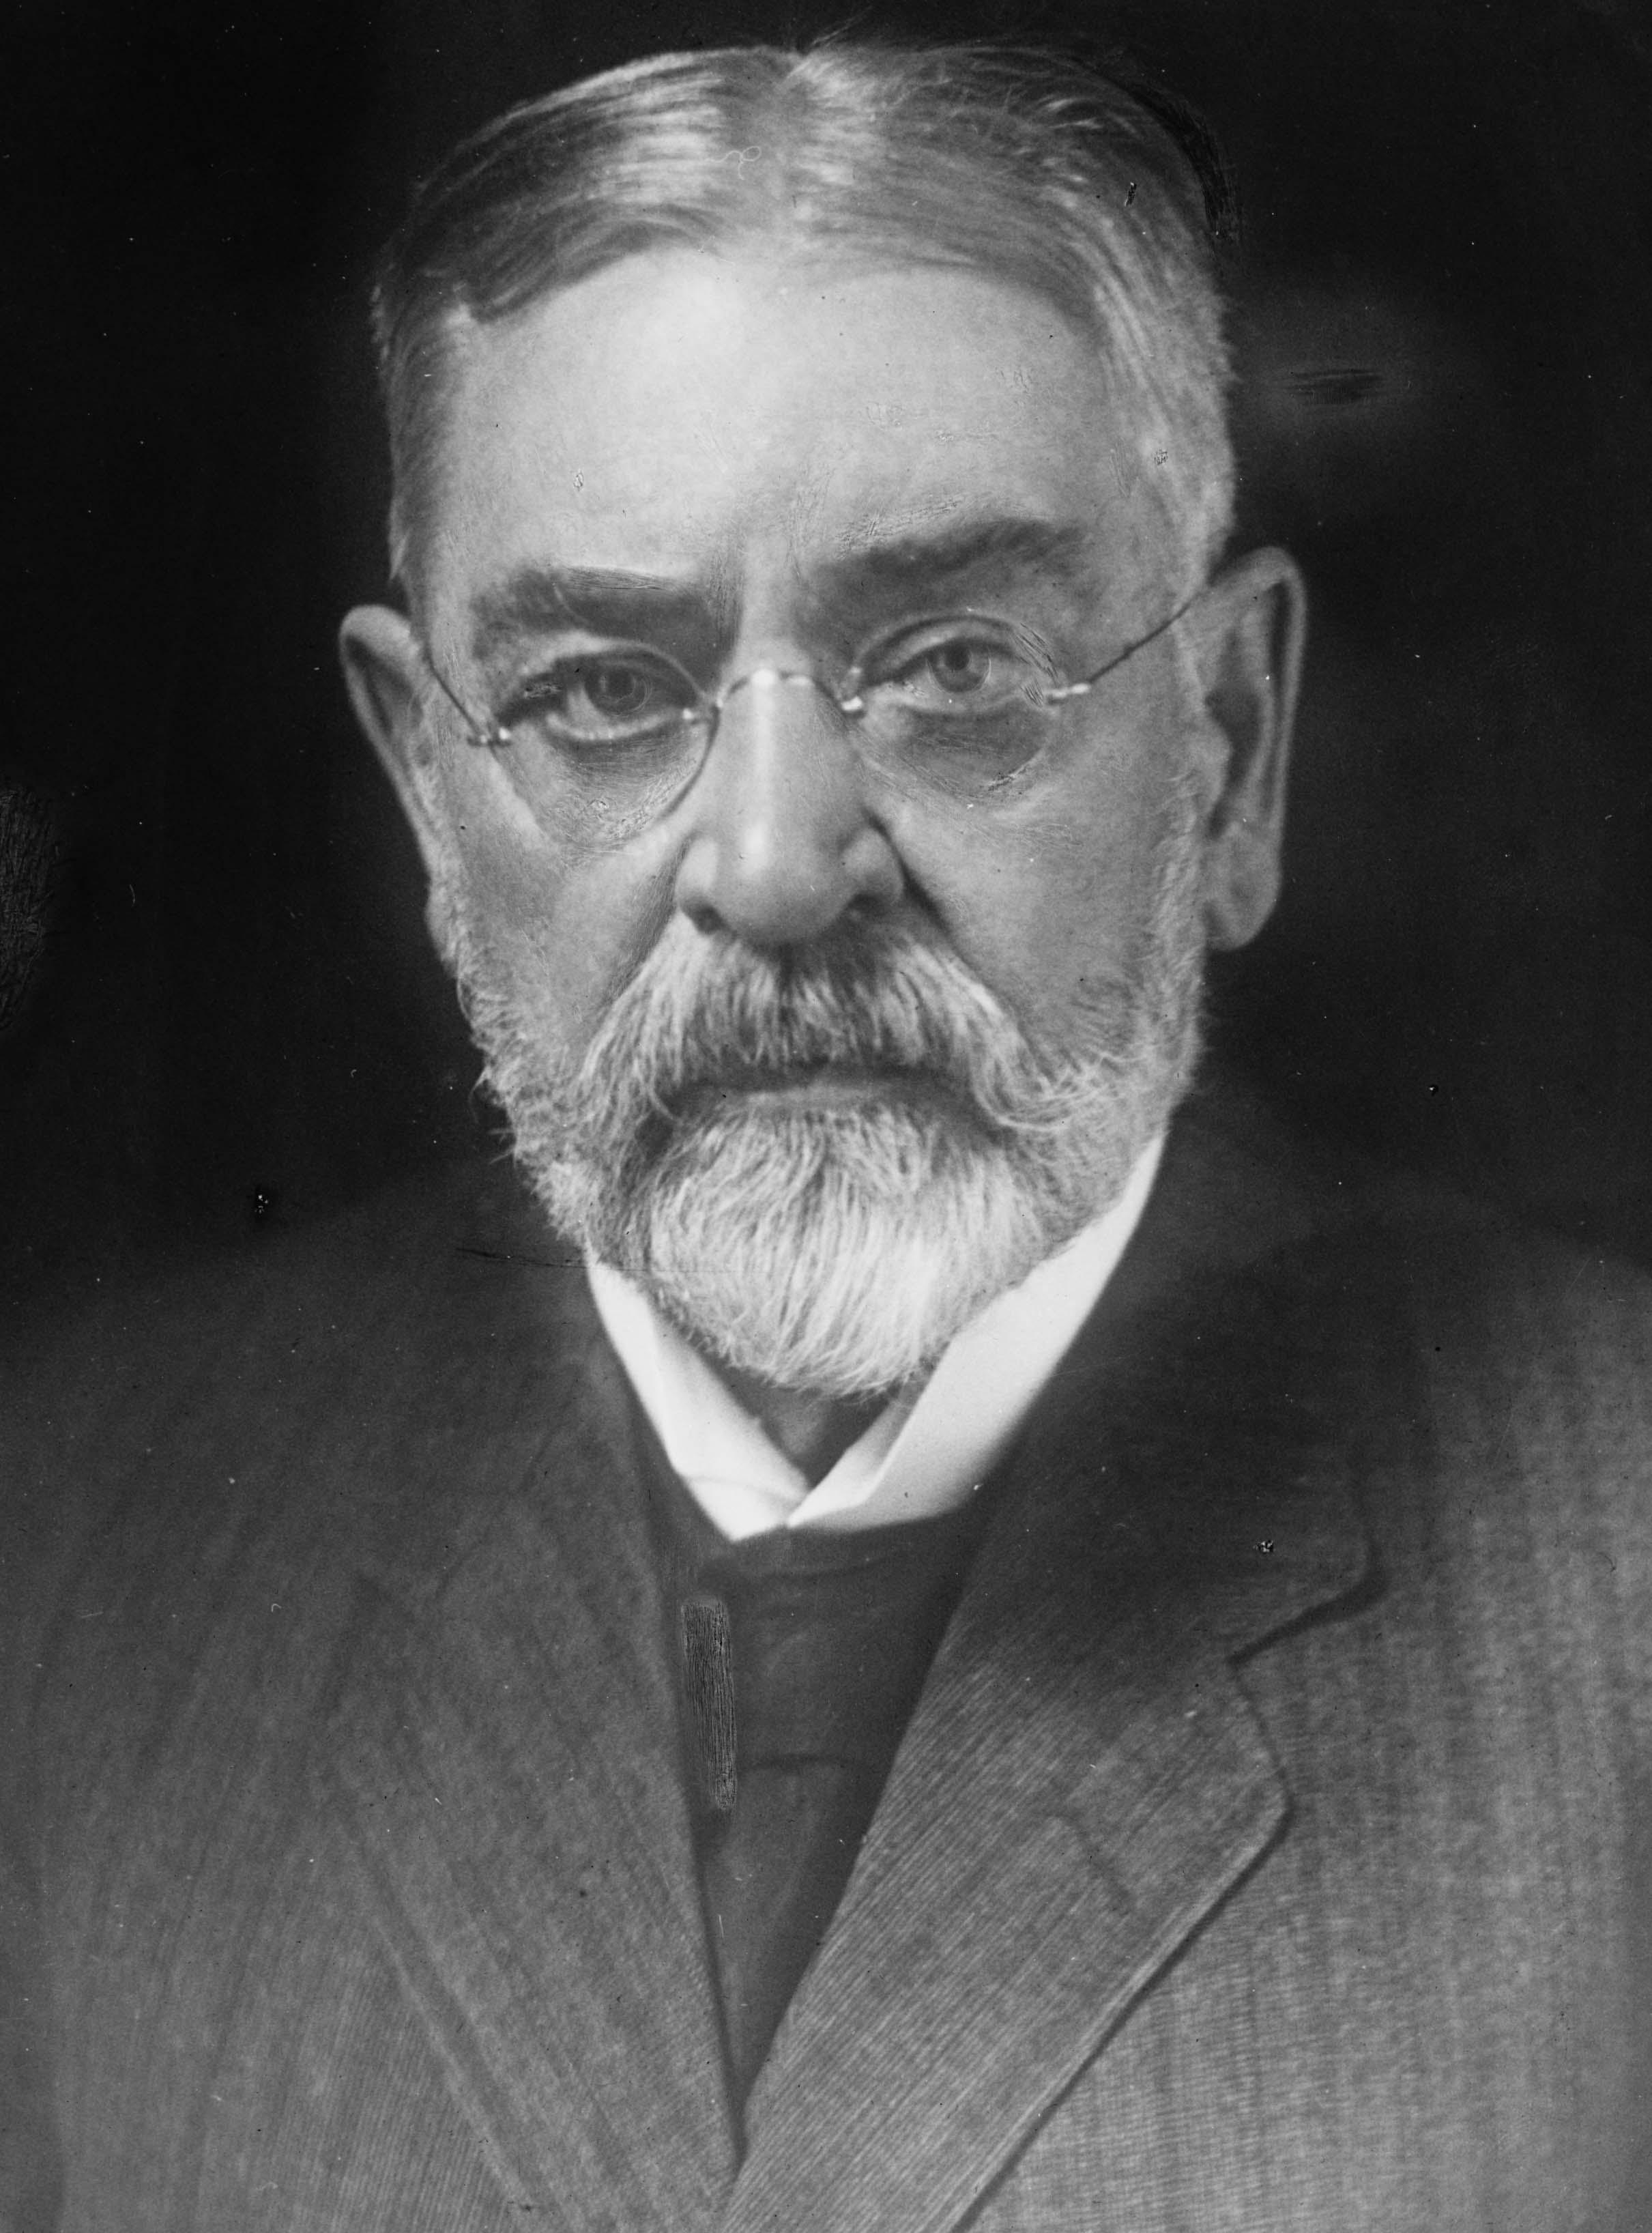 Robert Todd Lincoln (1843-1926)